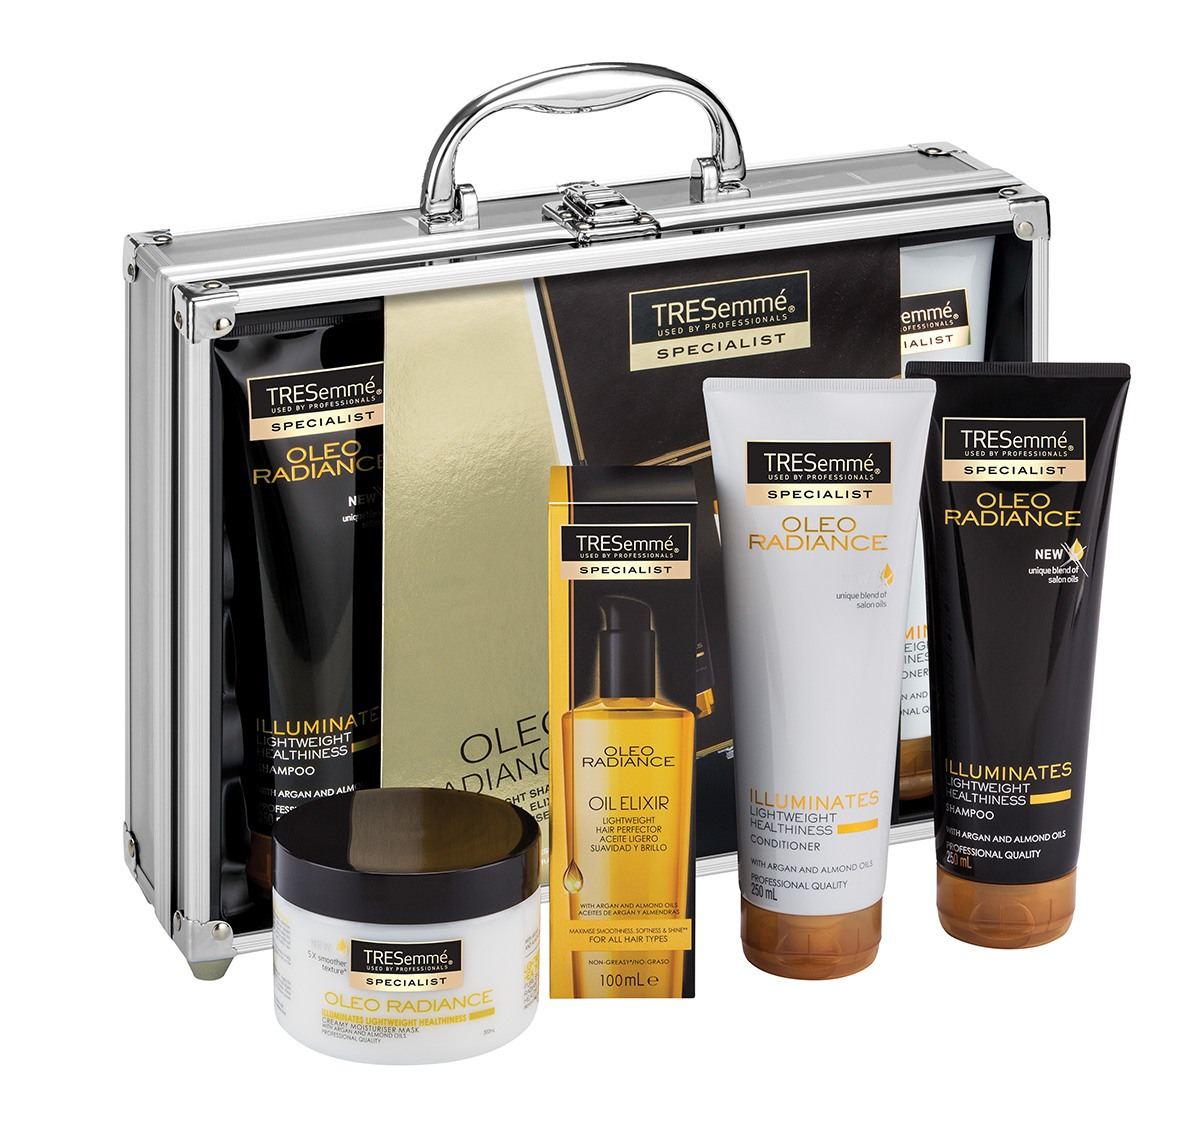 TRESemmé Oleo Radiance box gifts set